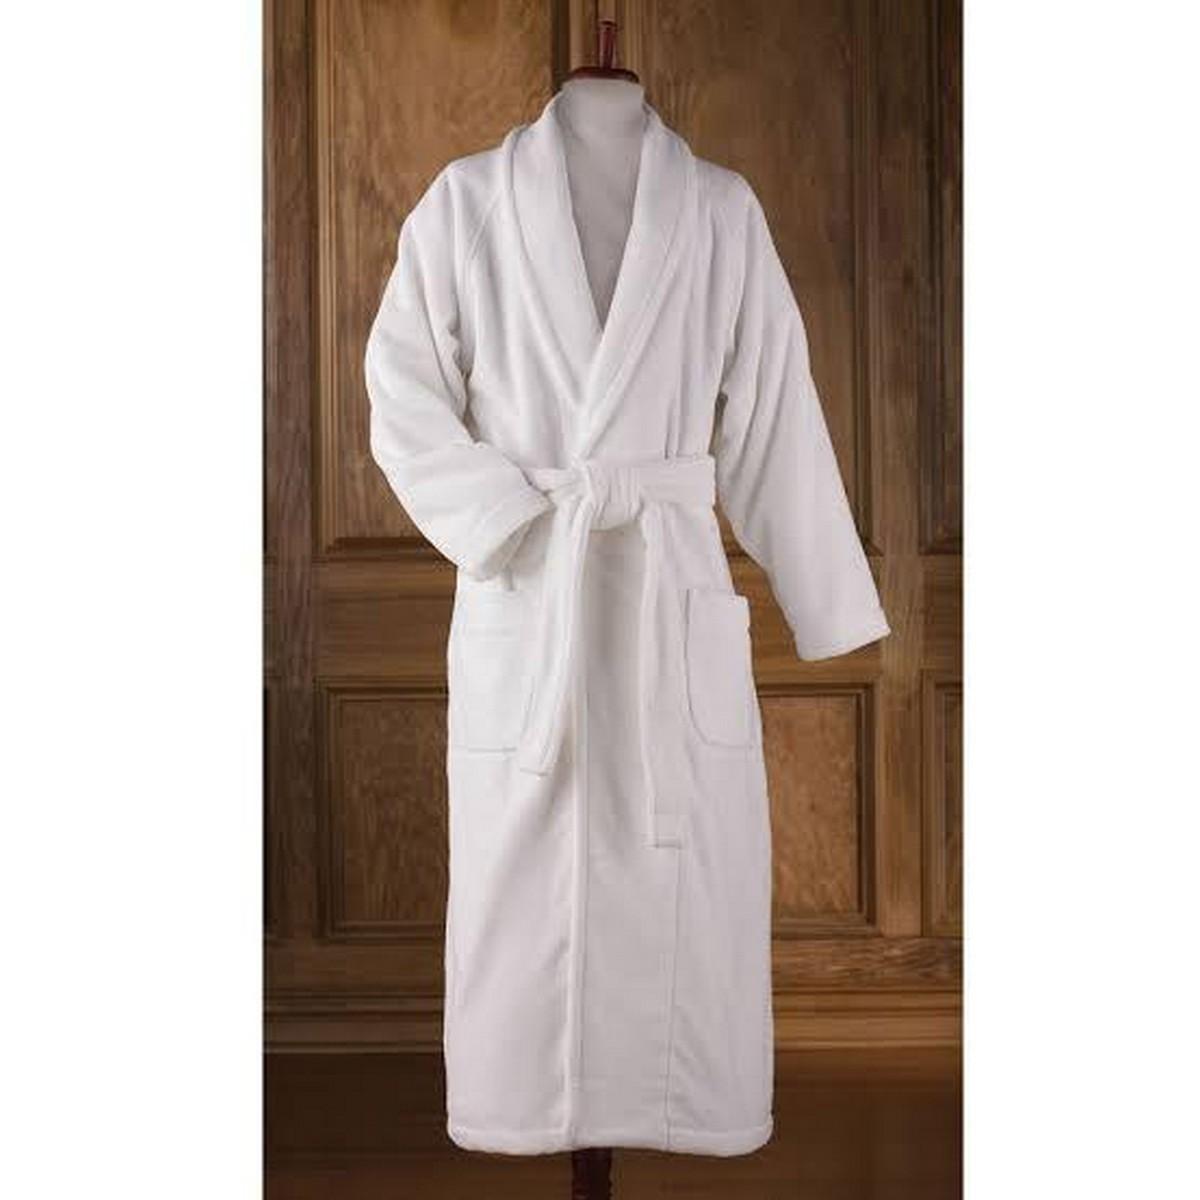 BATHROBE LUXURIOUS TOWEL FOR MEN AND WOMEN- FREE SIZE